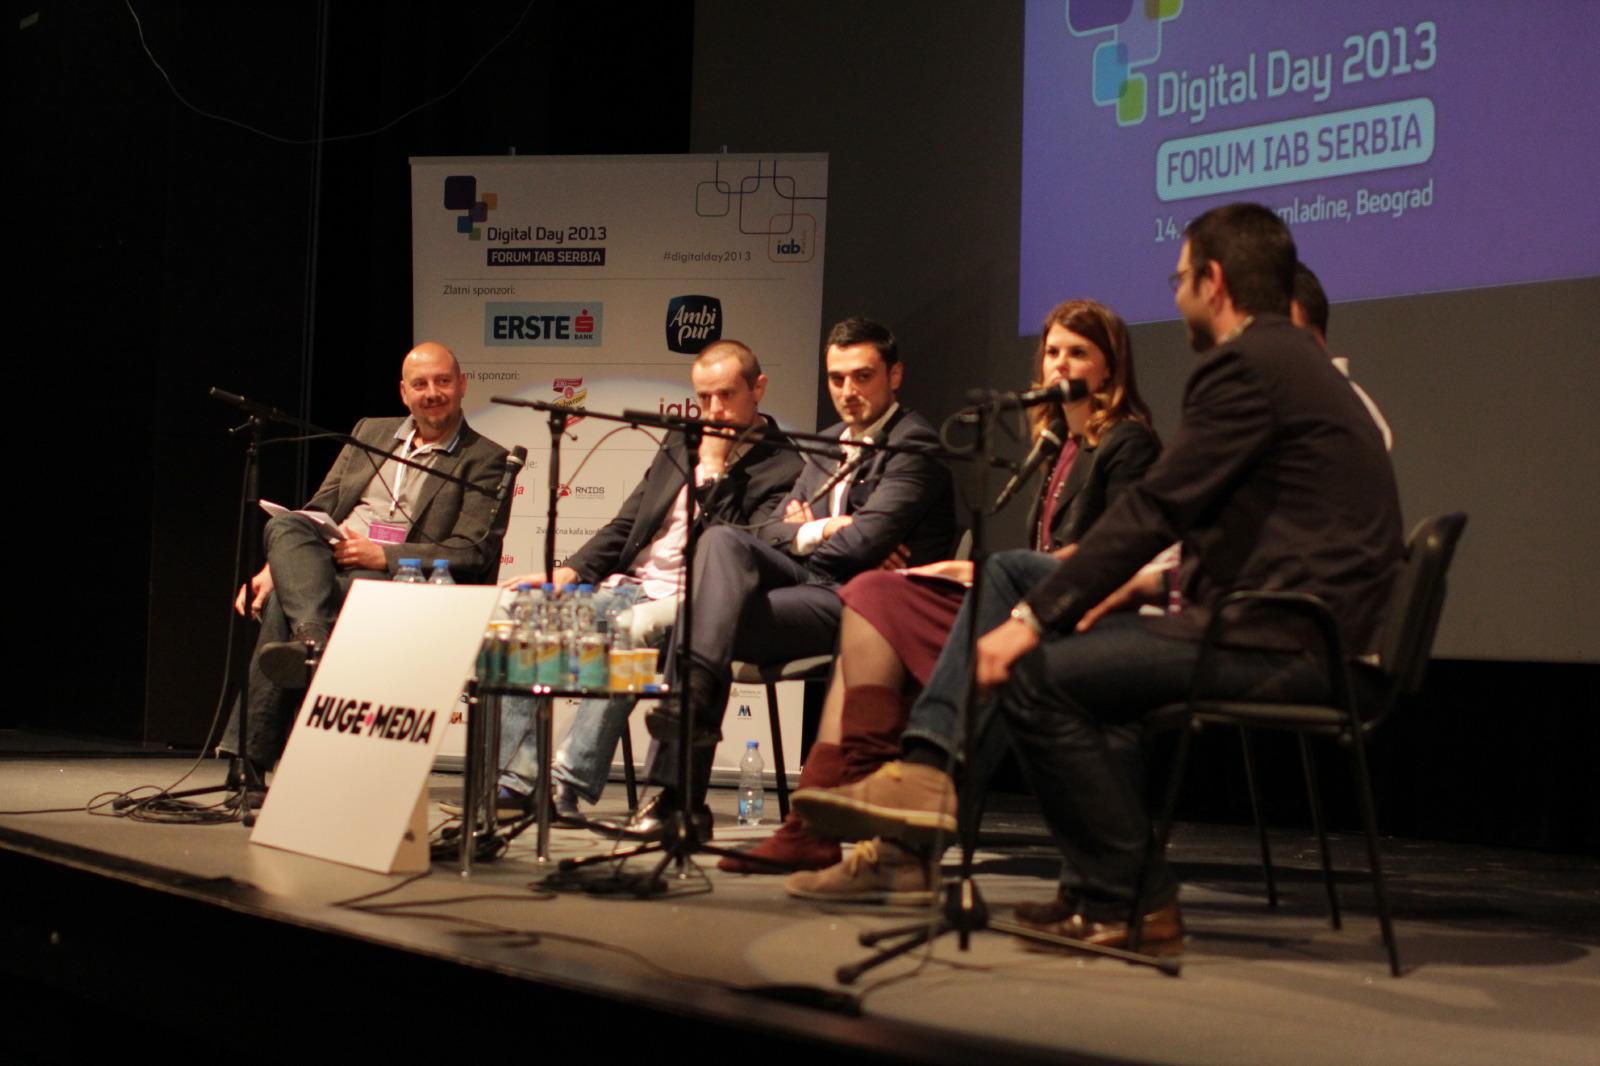 Dom omladine Digital Day 2013